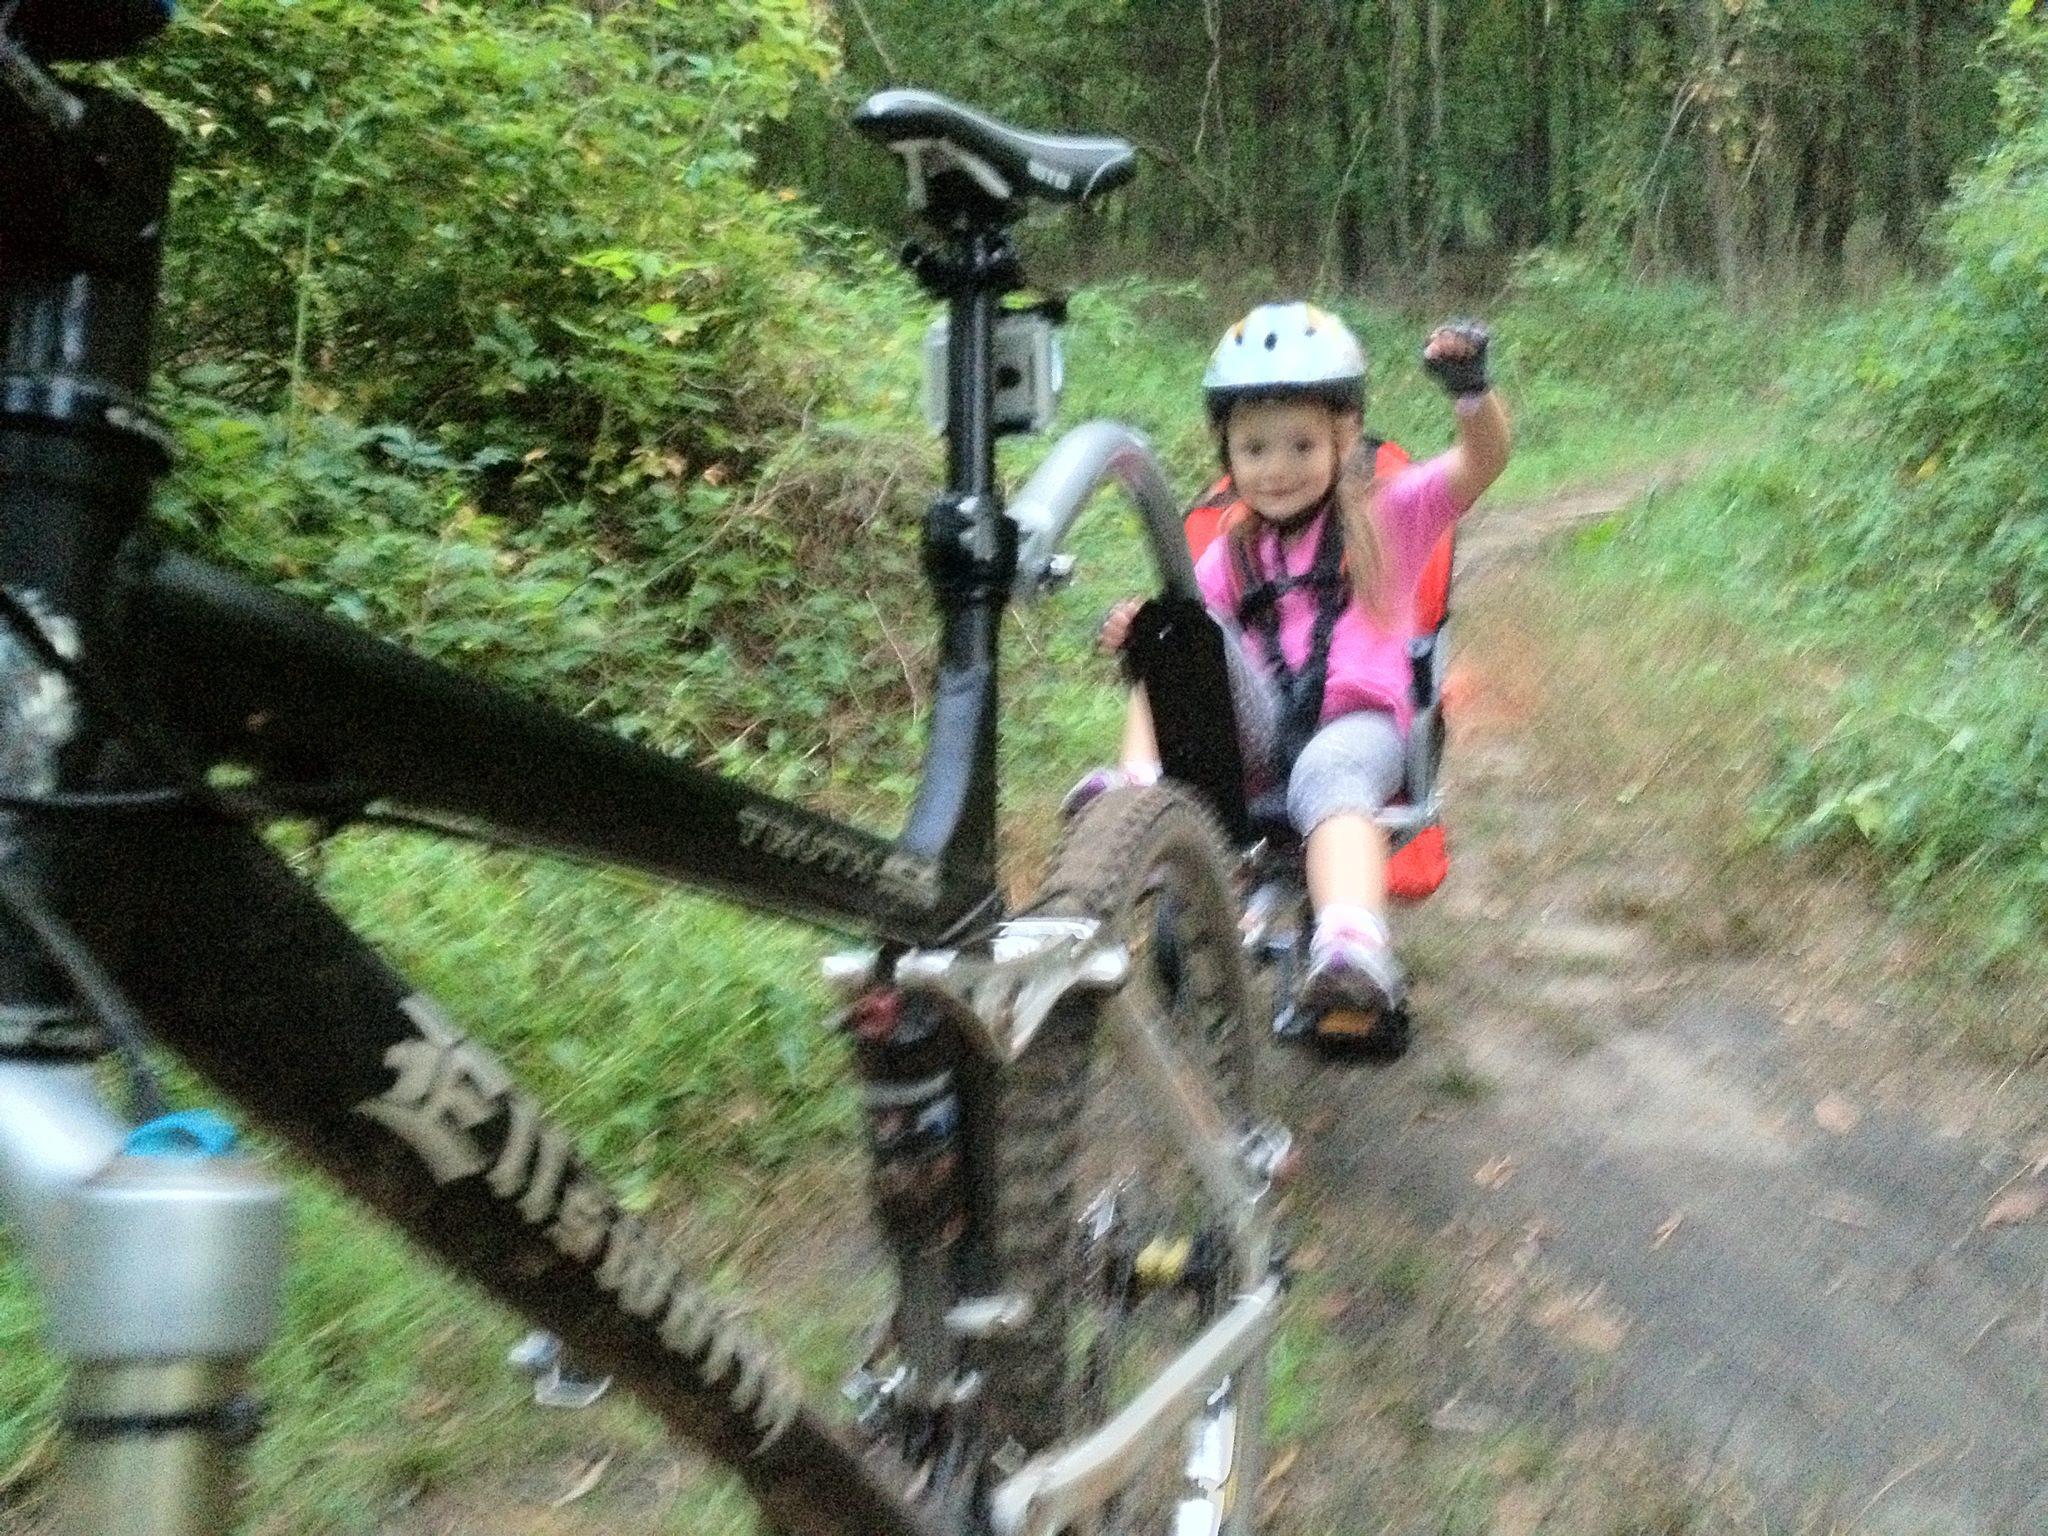 Kresson Trails